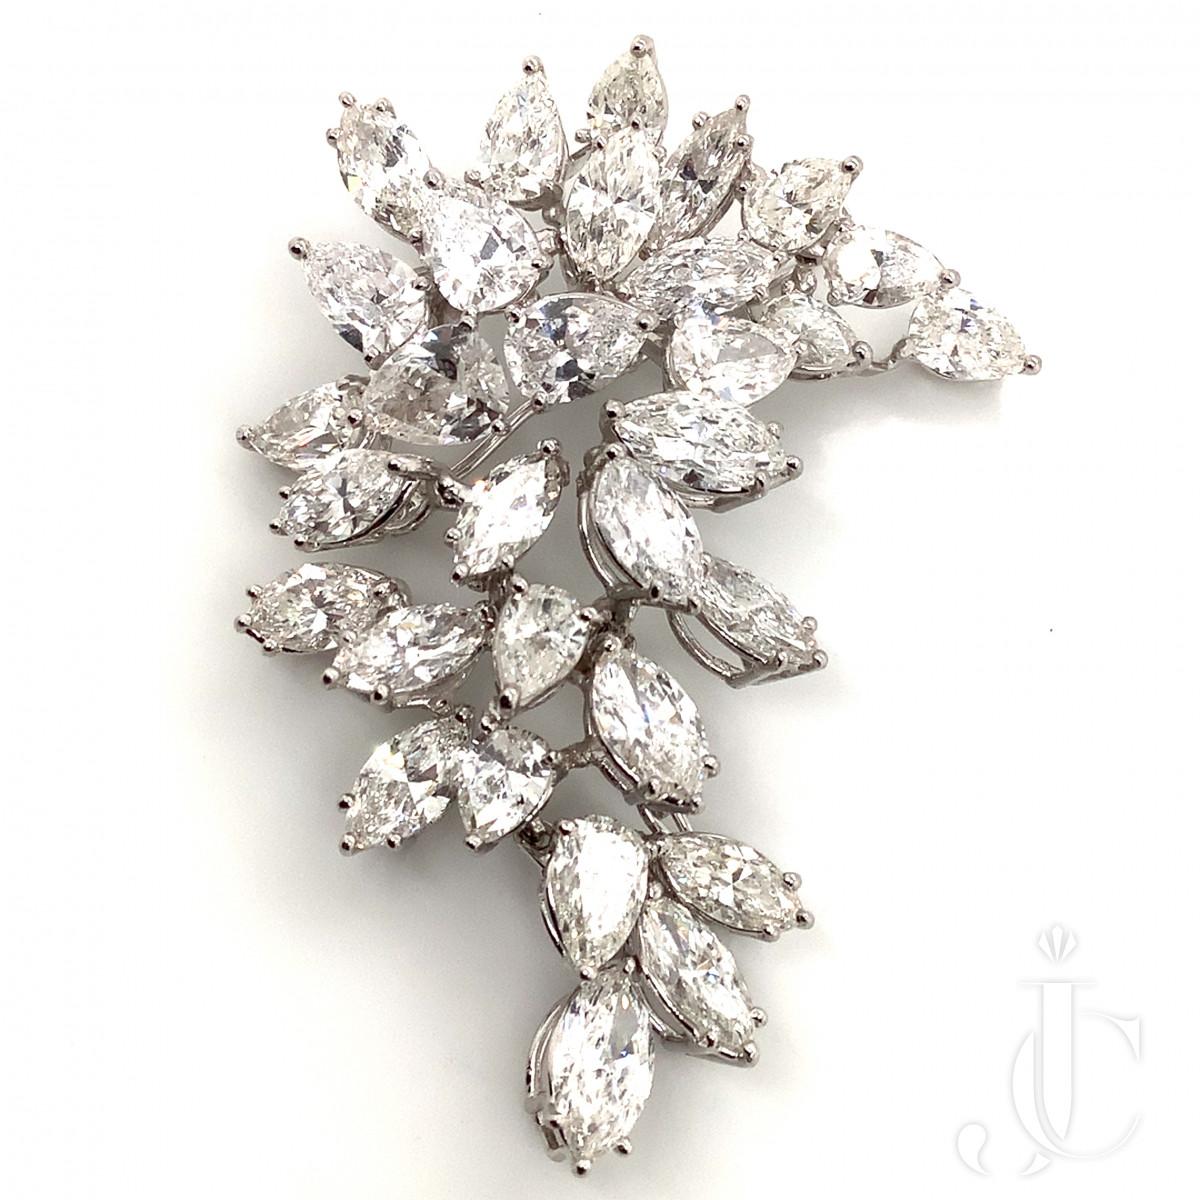 Diamond Stone-on-Stone Brooch